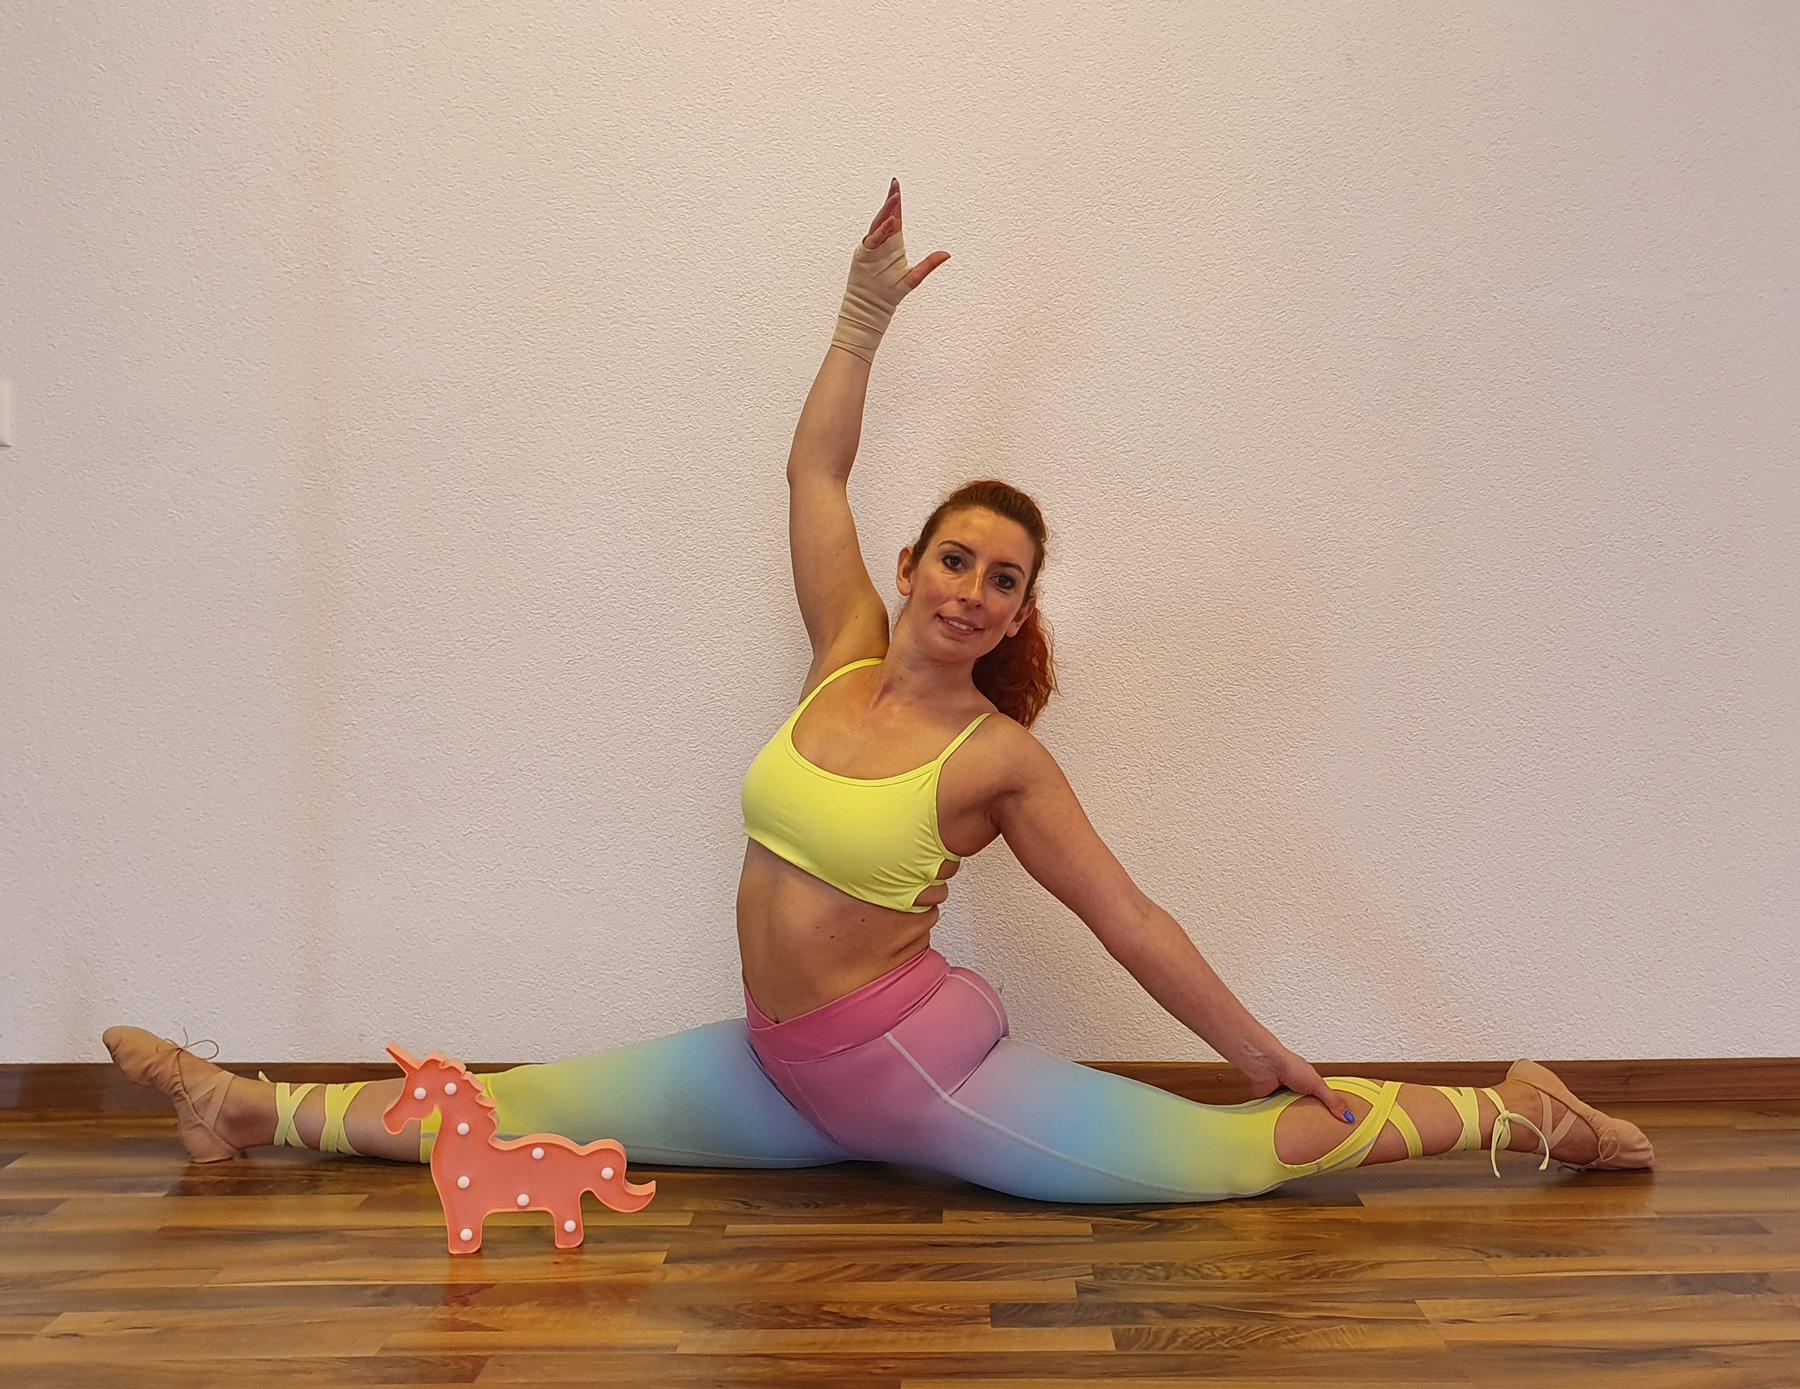 Noëmi Graber Mandy Candy's pole dance studio